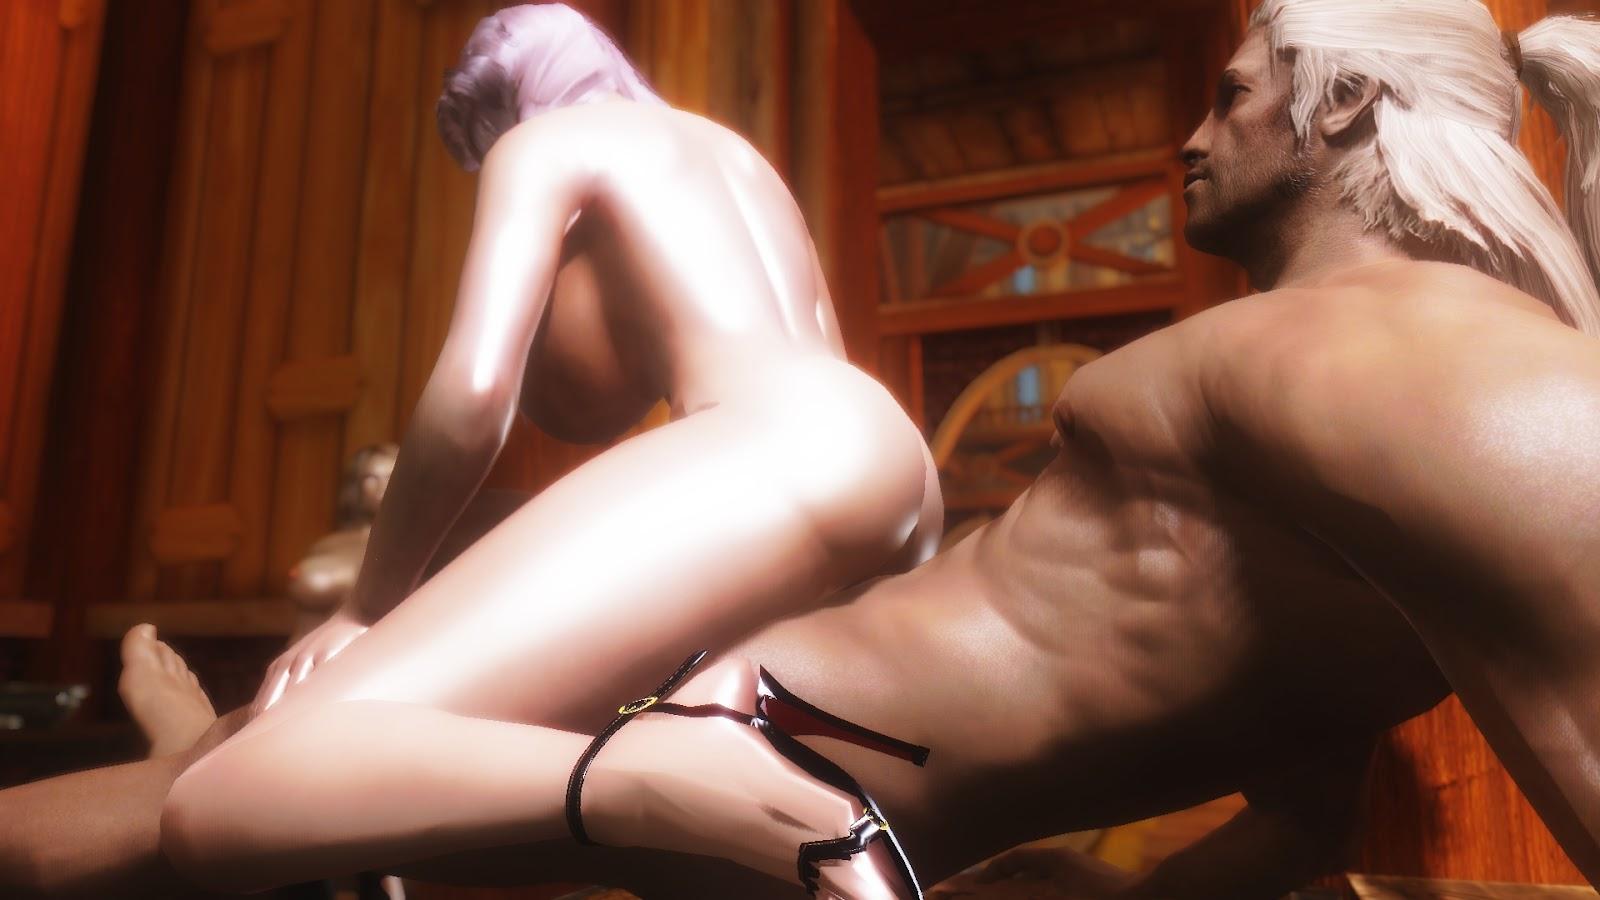 Pale skin nudes sex download